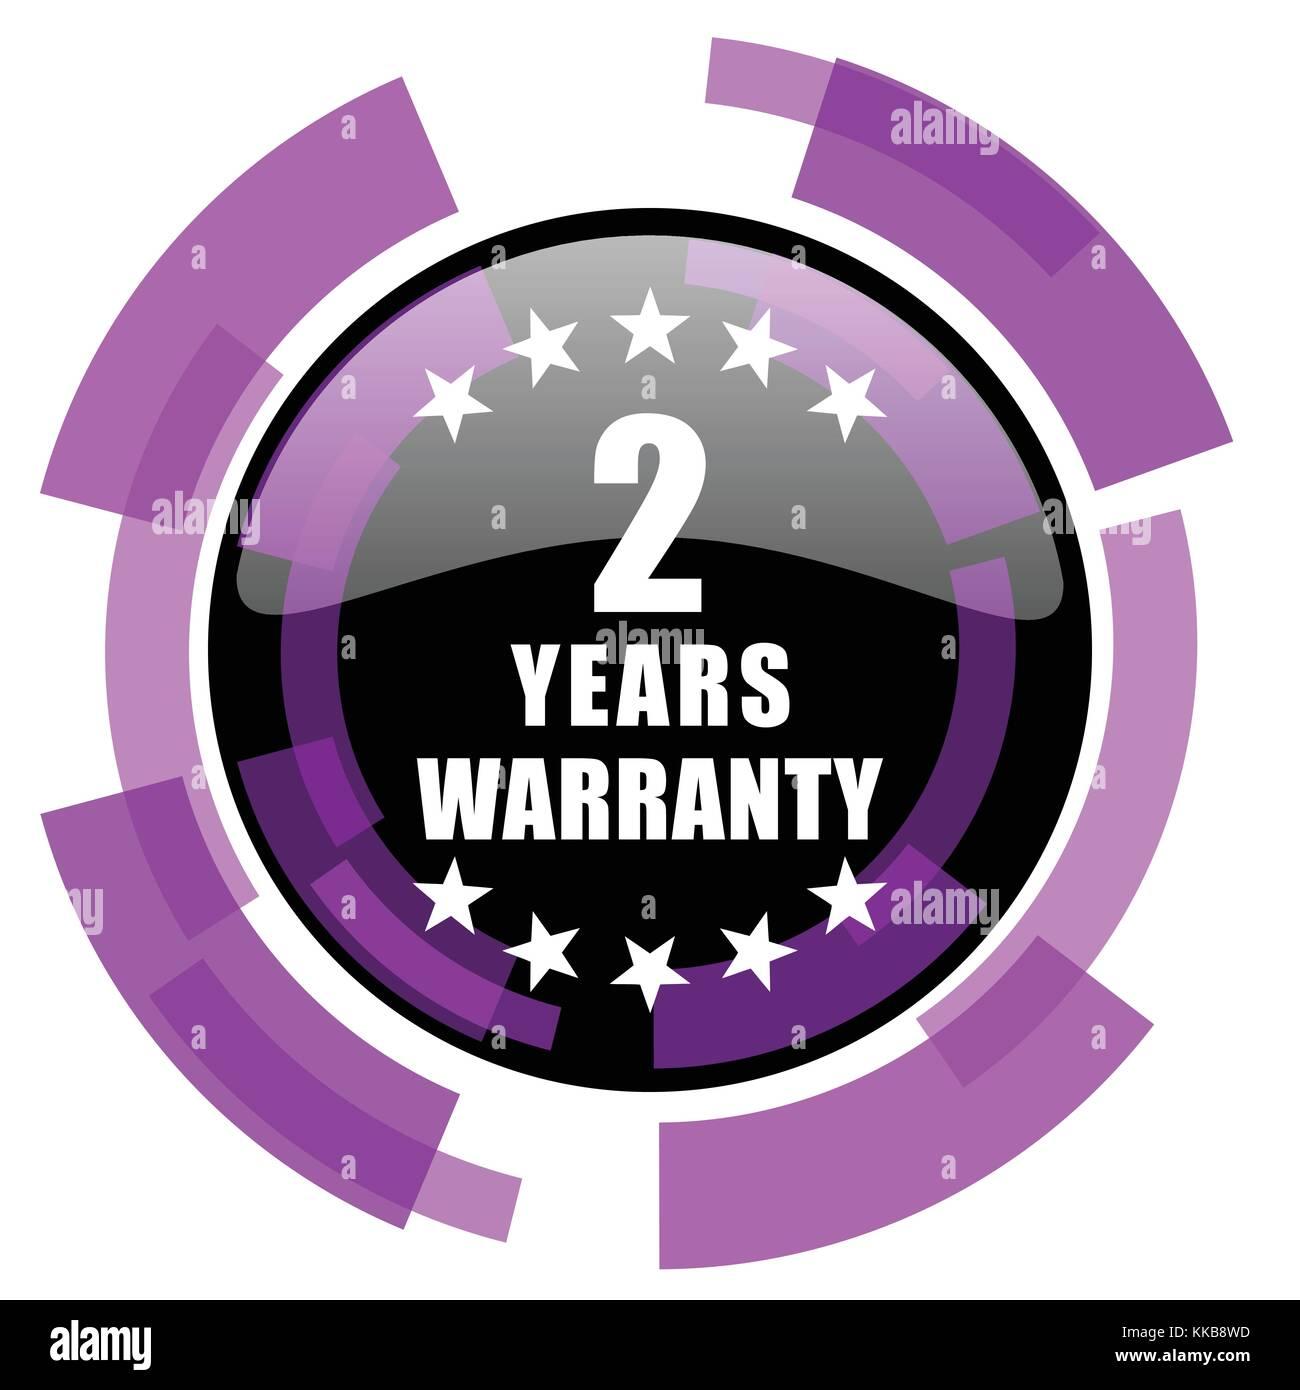 Warranty guarantee 2 year pink violet modern design vector